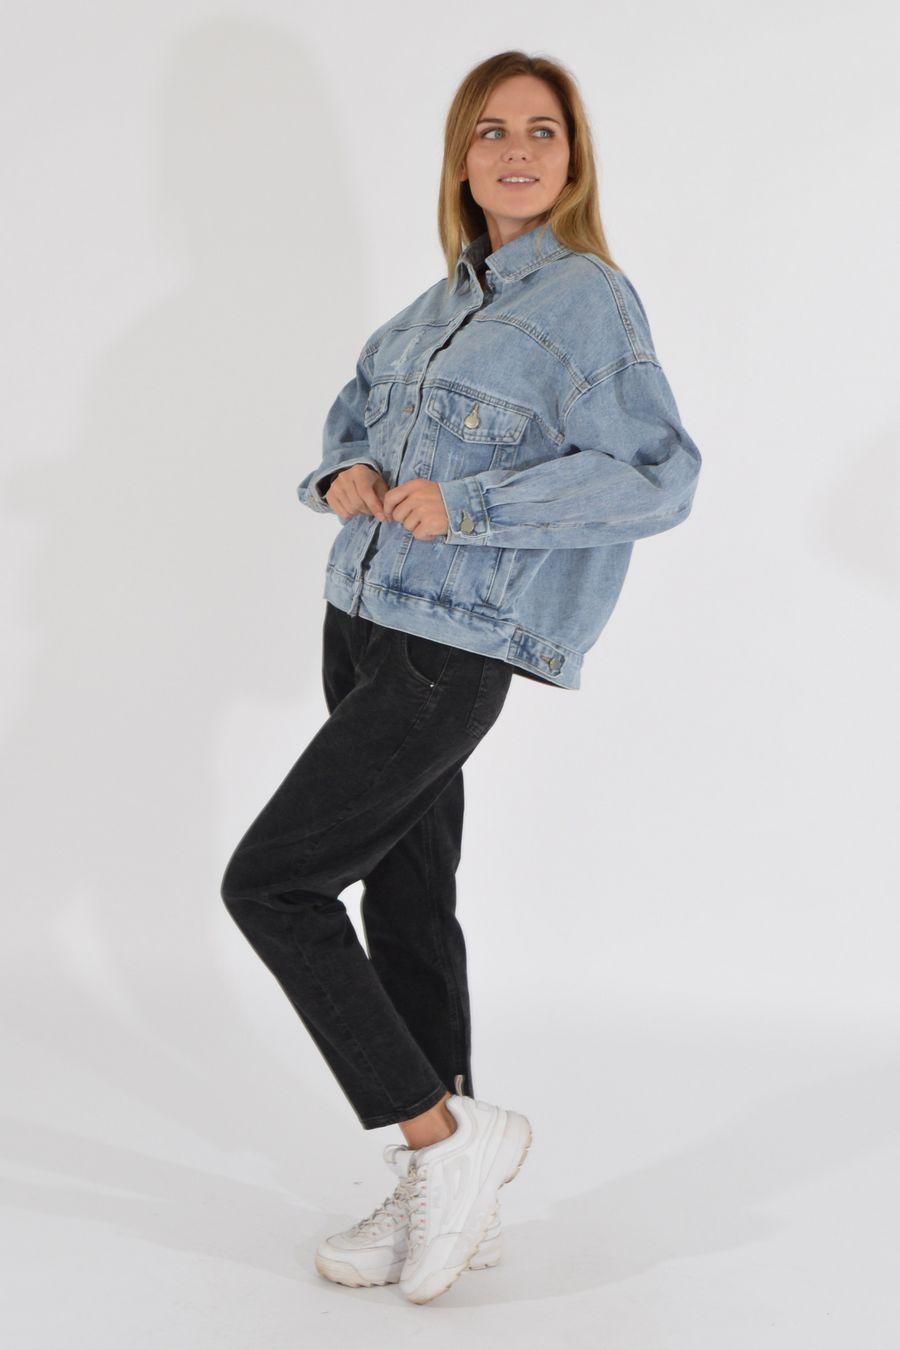 Жакет женский (джинсовка) LRZBS 2189 - фото 3